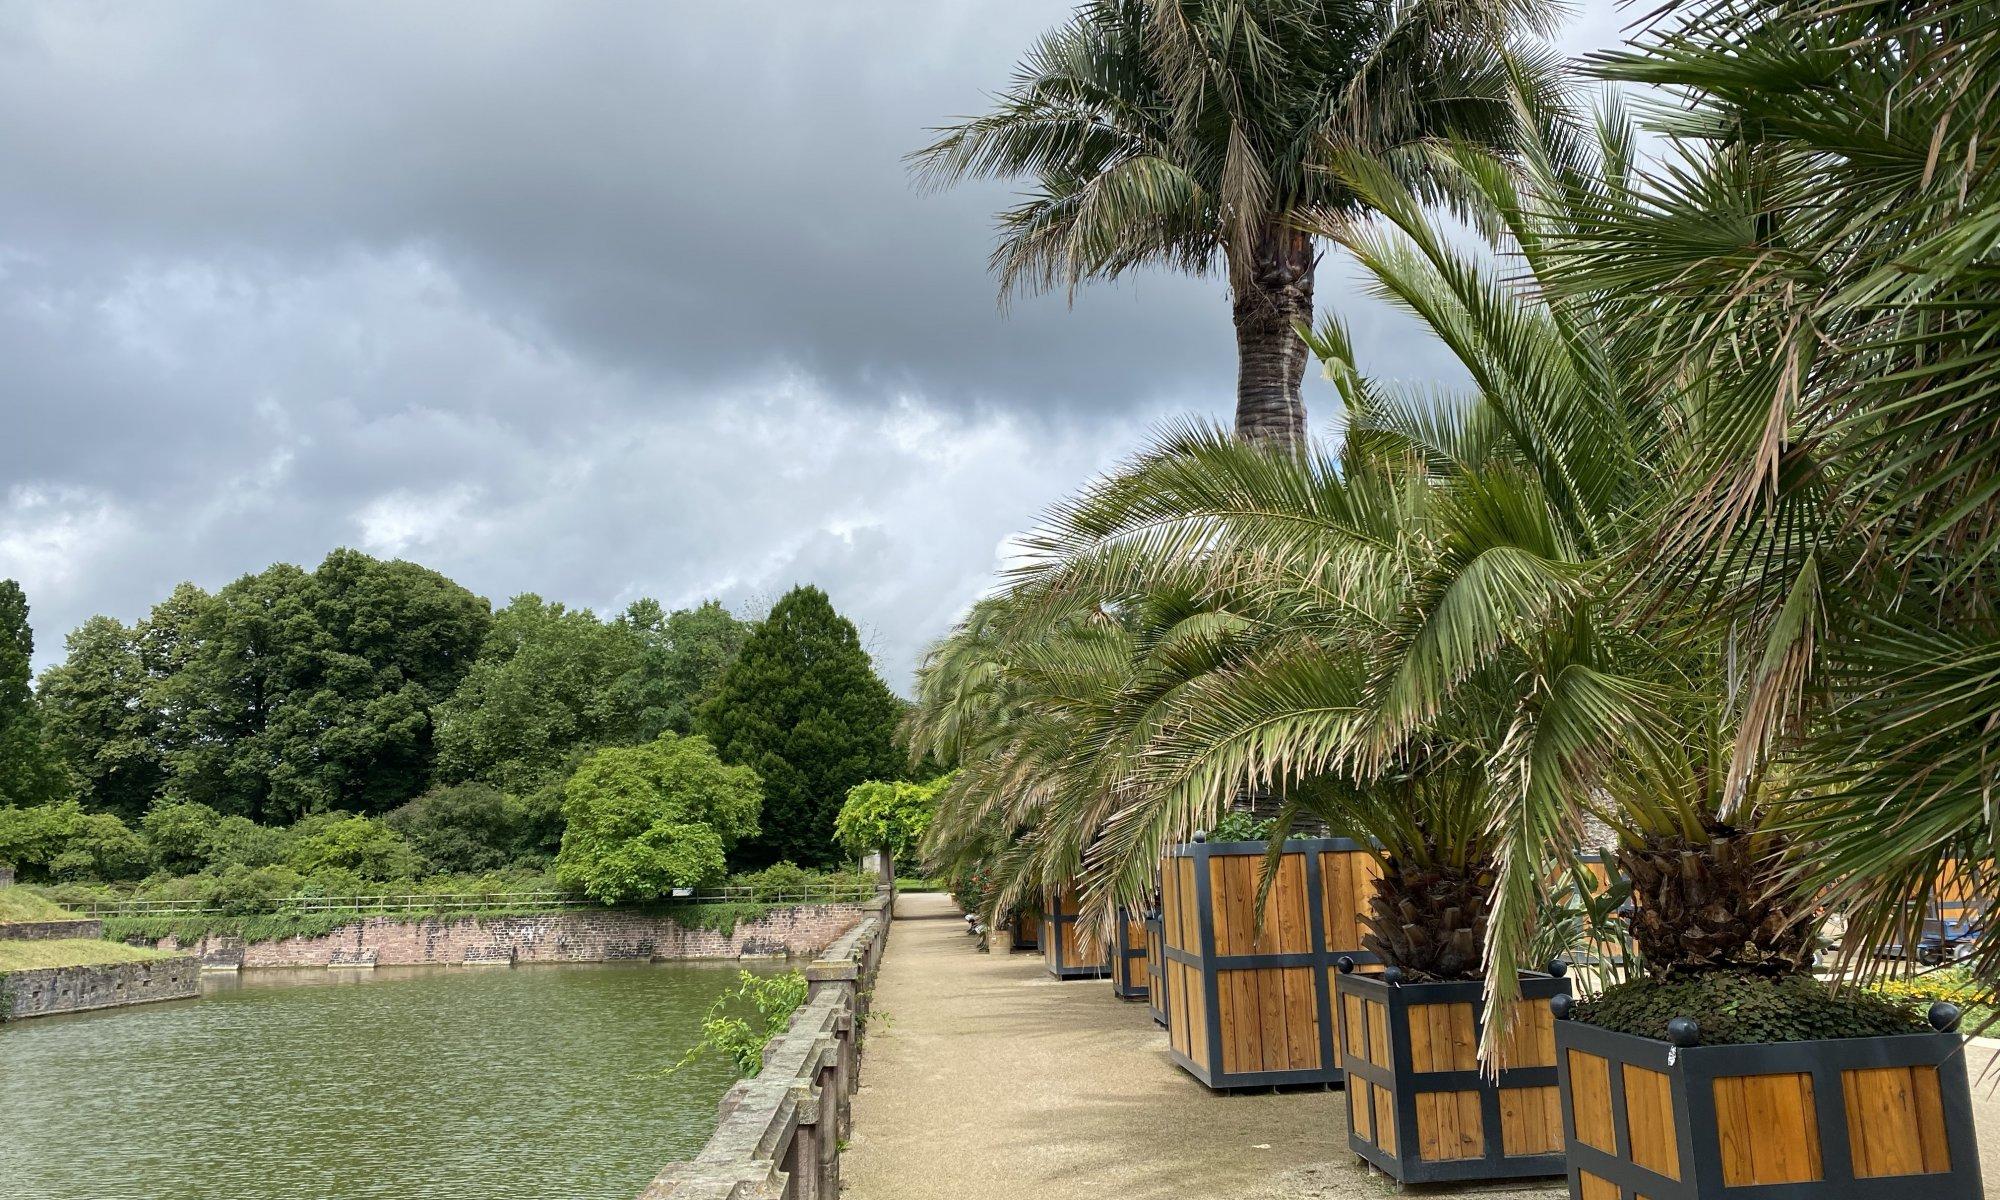 Palmengarten, Bad Pyrmont